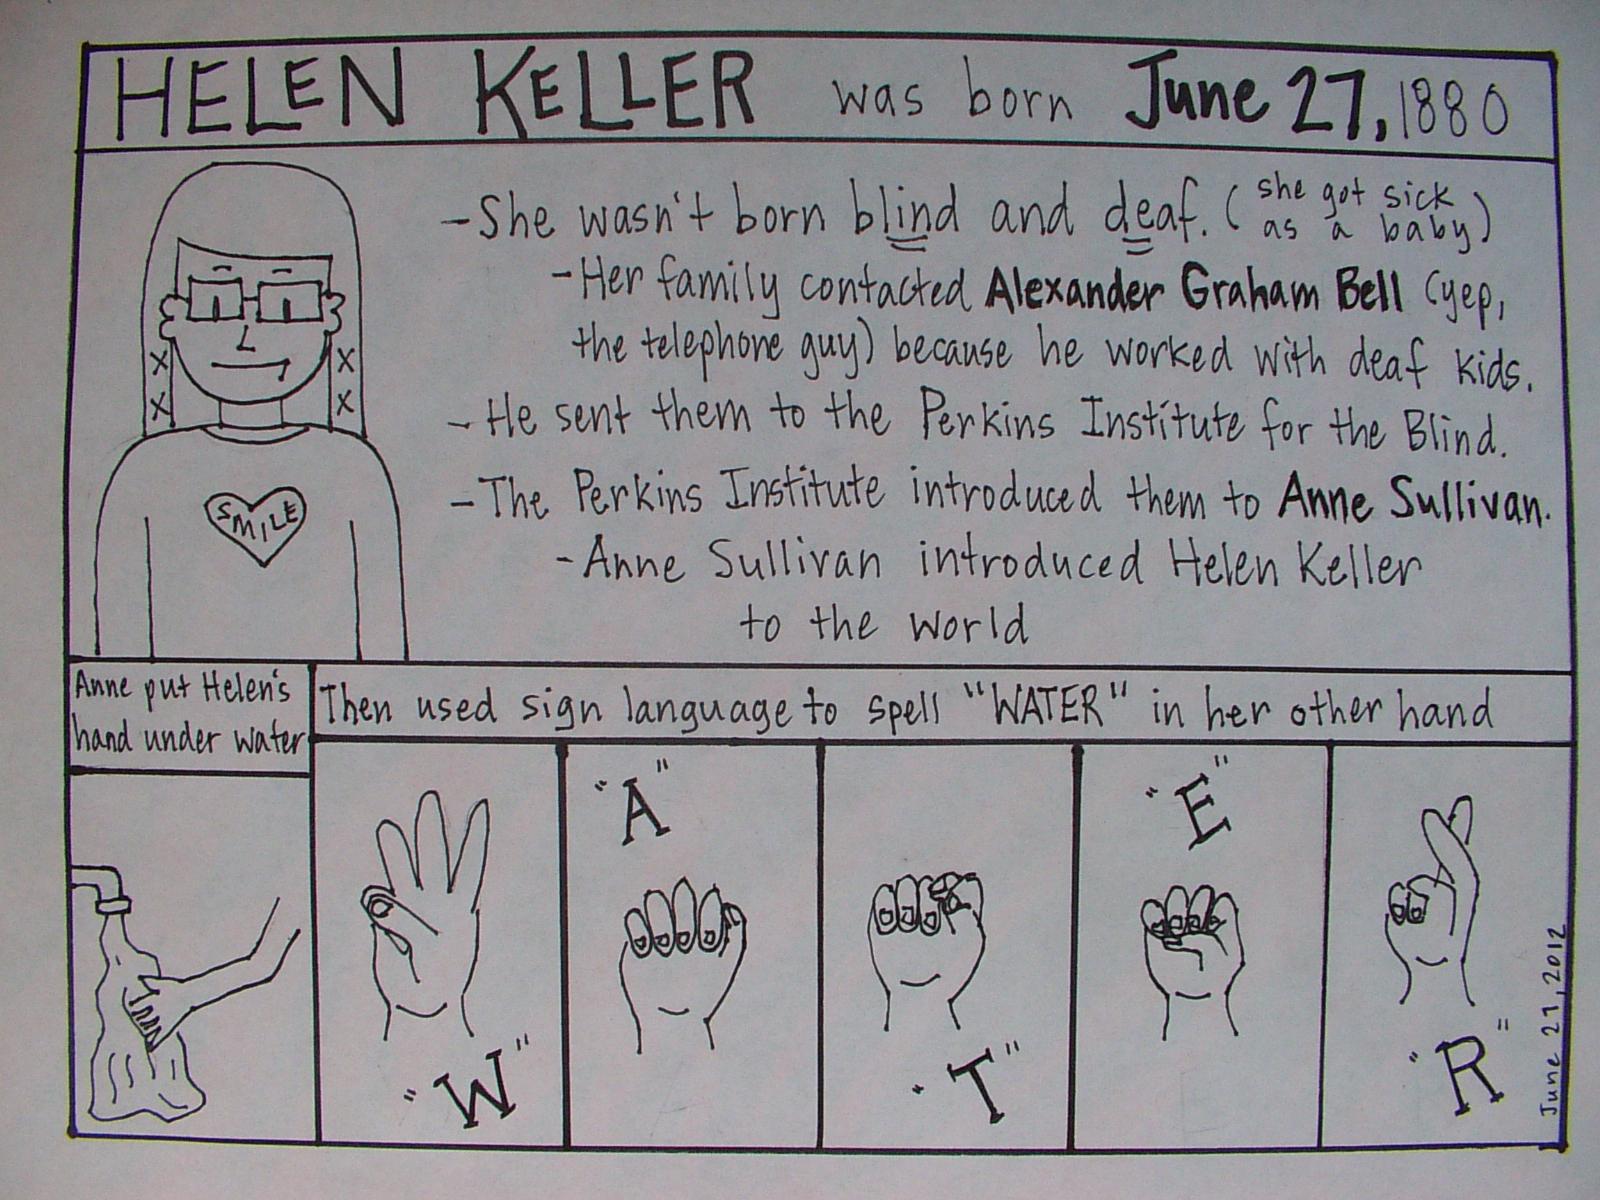 Helen Kellervmr